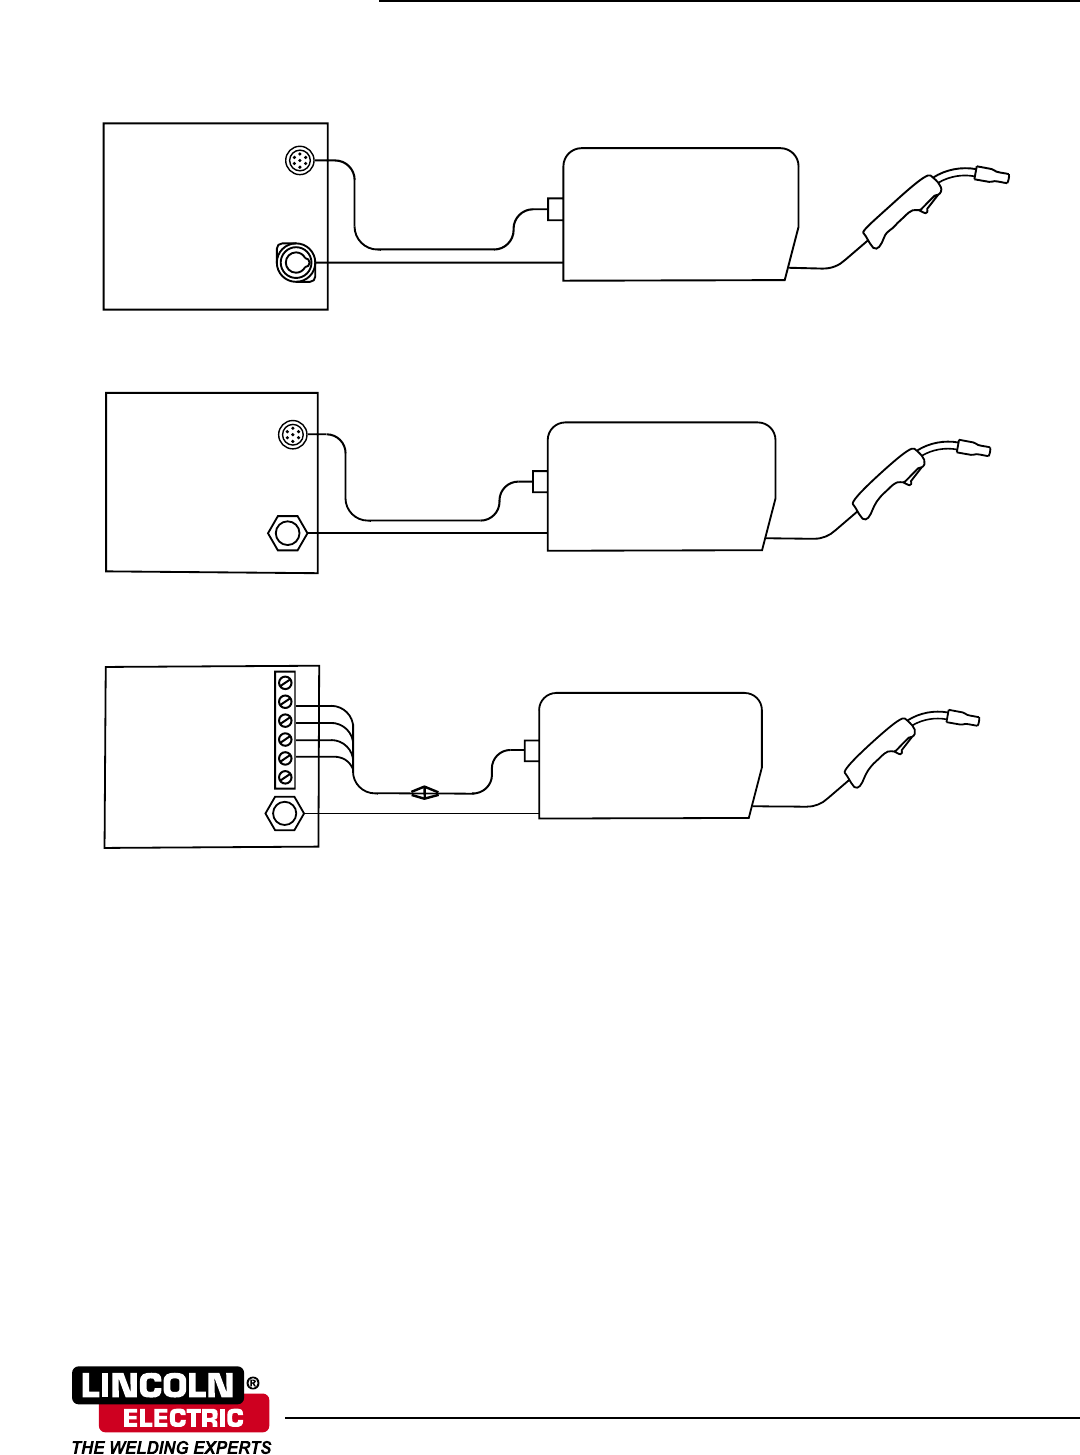 lincoln 305g wiring diagram ln 15 11  ln 15 11